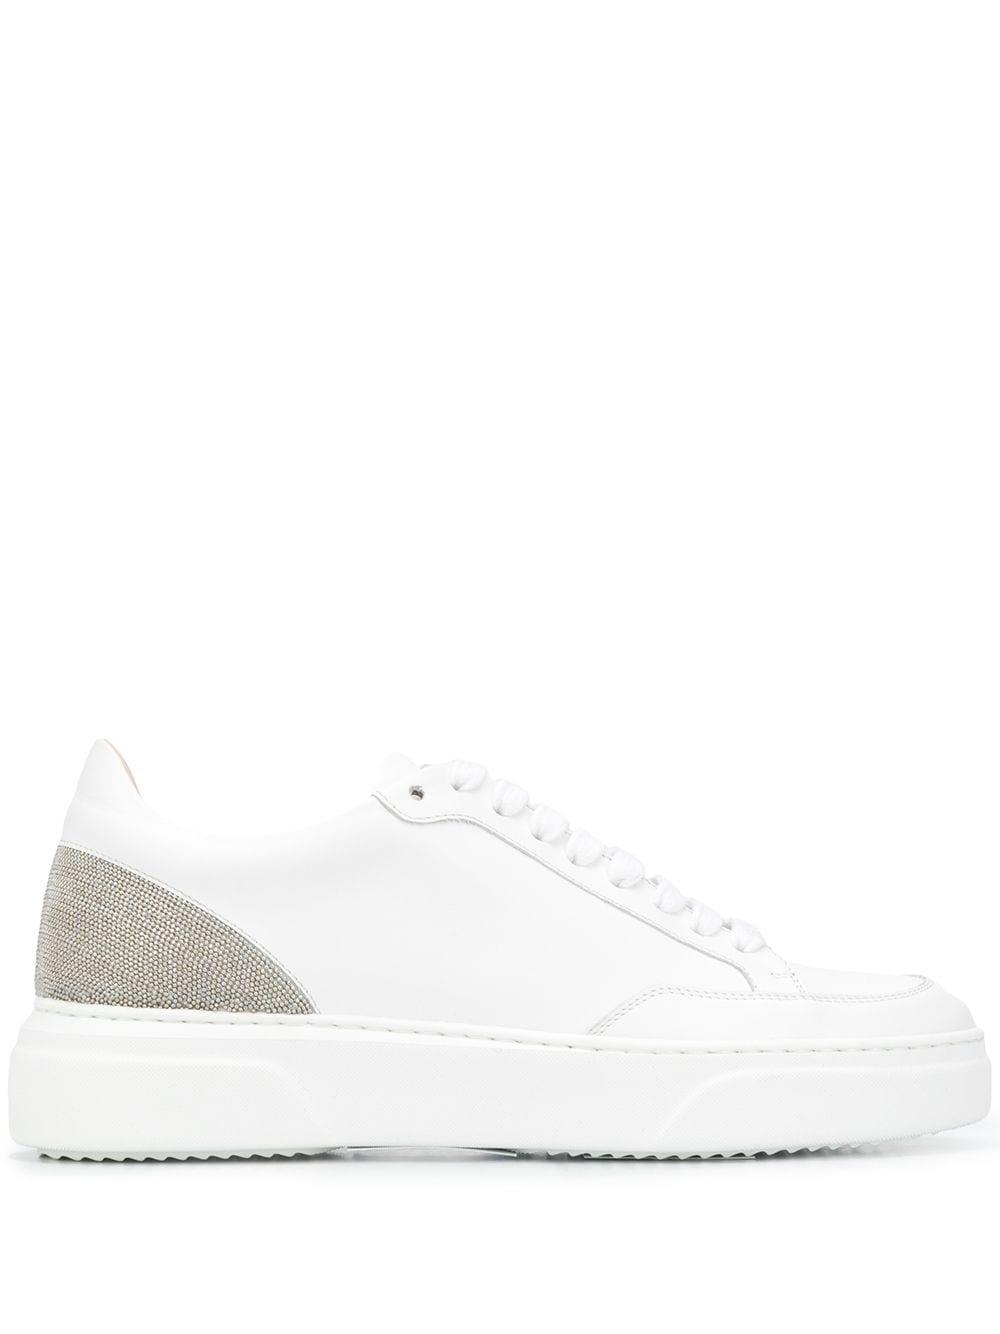 Giulia Leather Sneakers